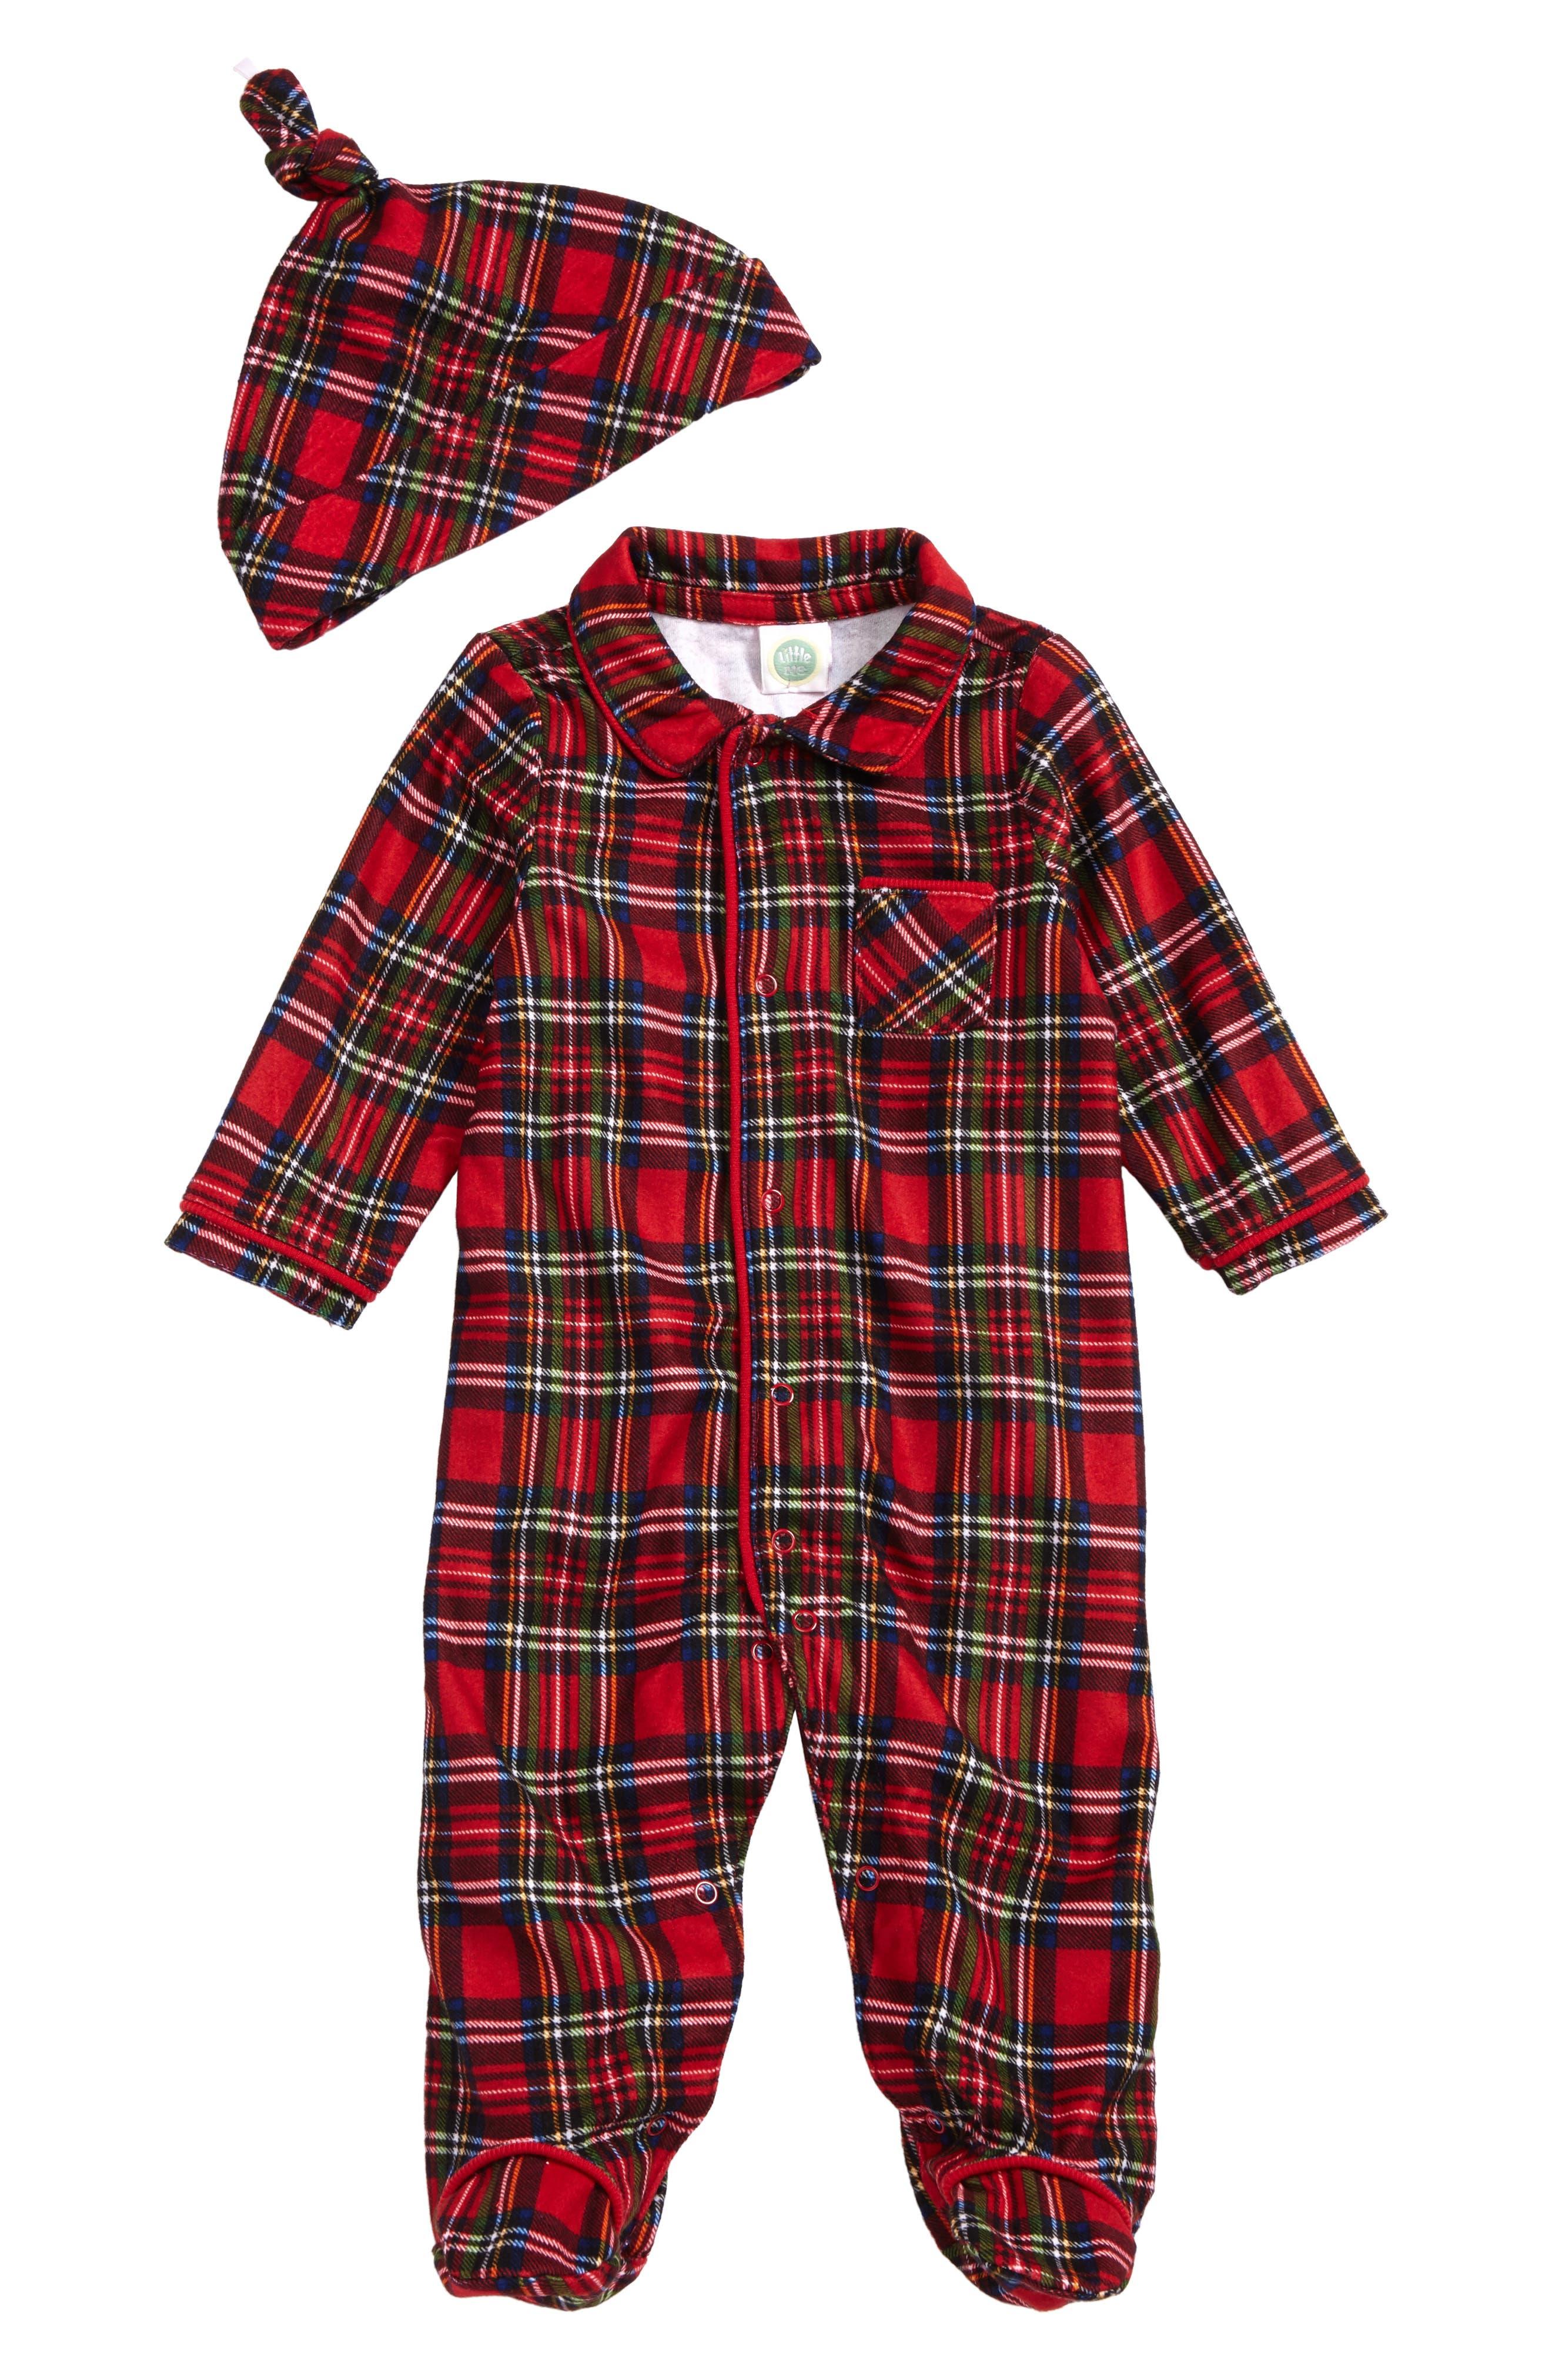 Main Image - Little Me Plaid Footie Pajamas & Hat Set (Baby Boys)